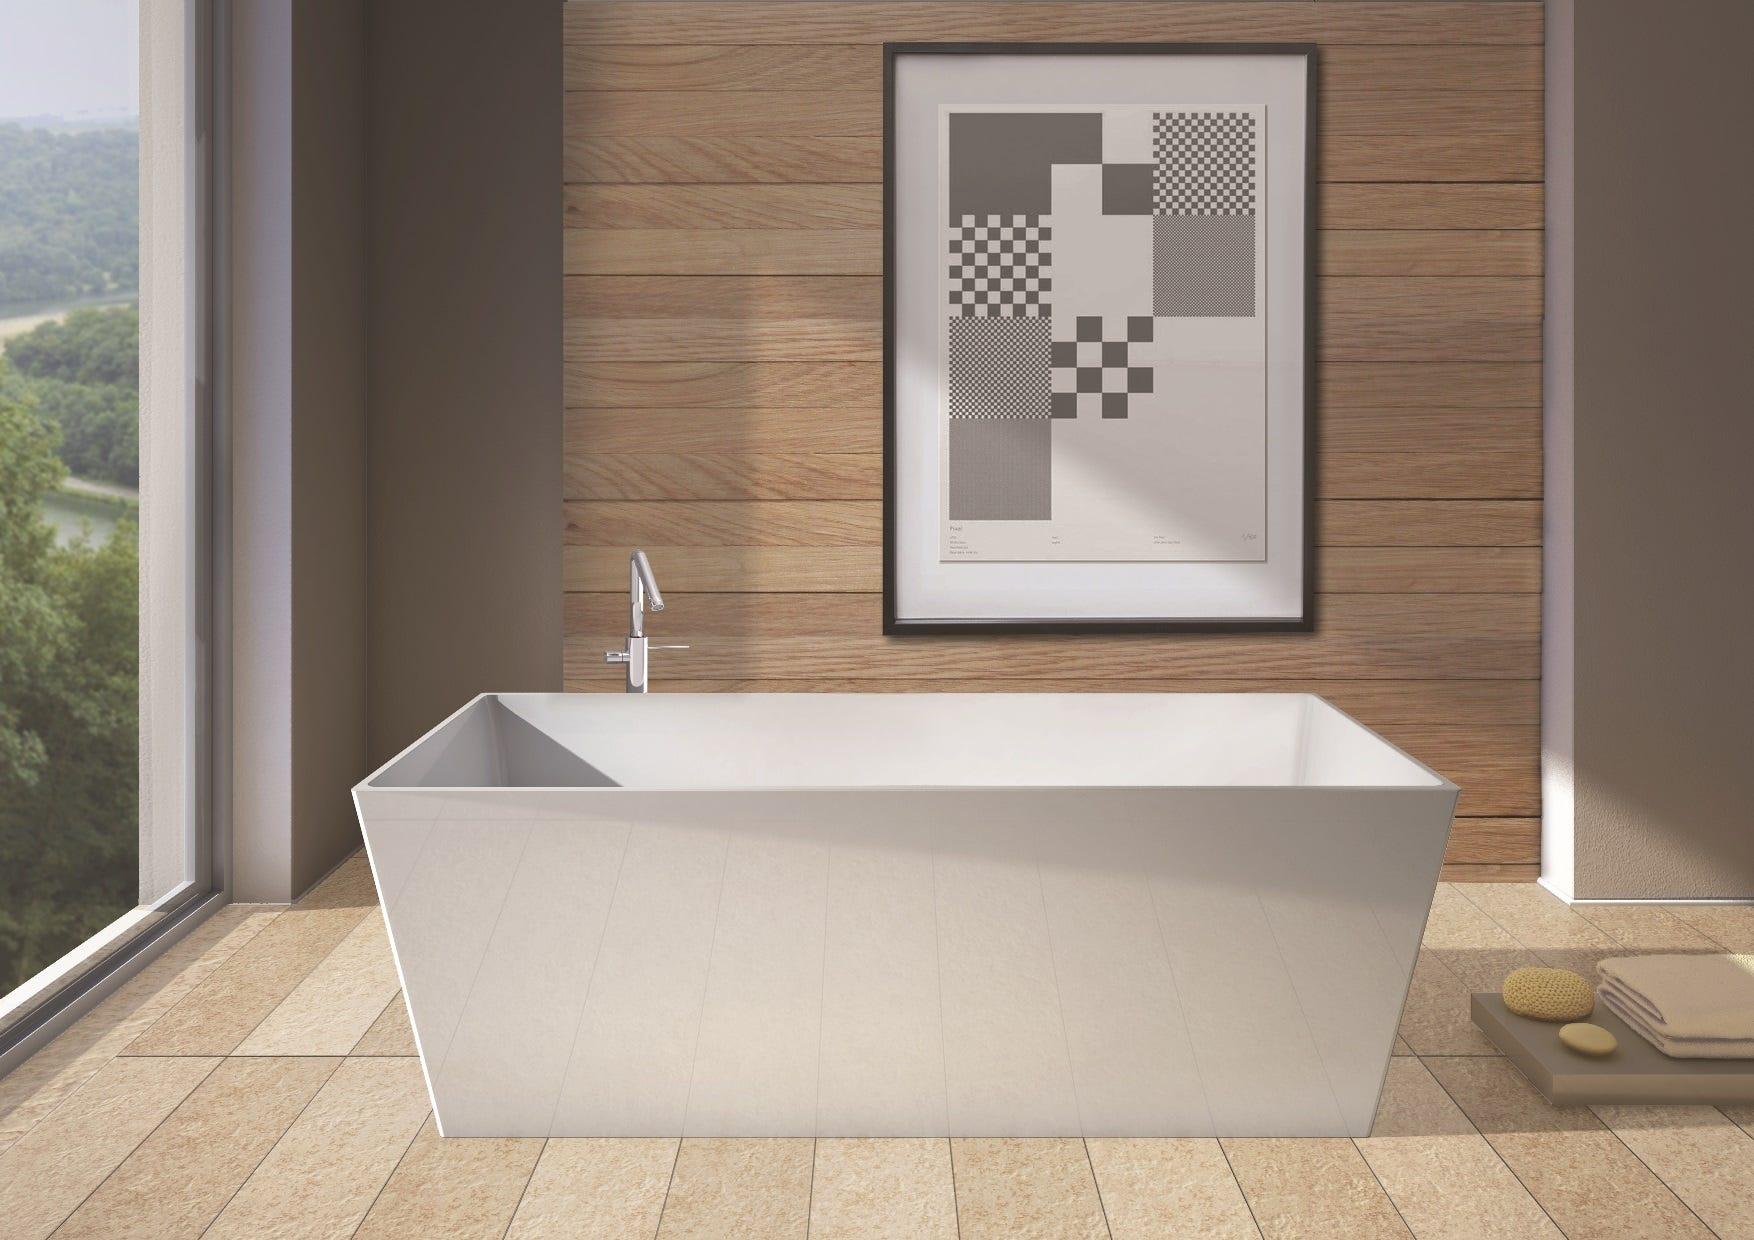 Vasca da bagno da design moderno quadra modello york in bianco lucido ebay - Vasca bagno design ...